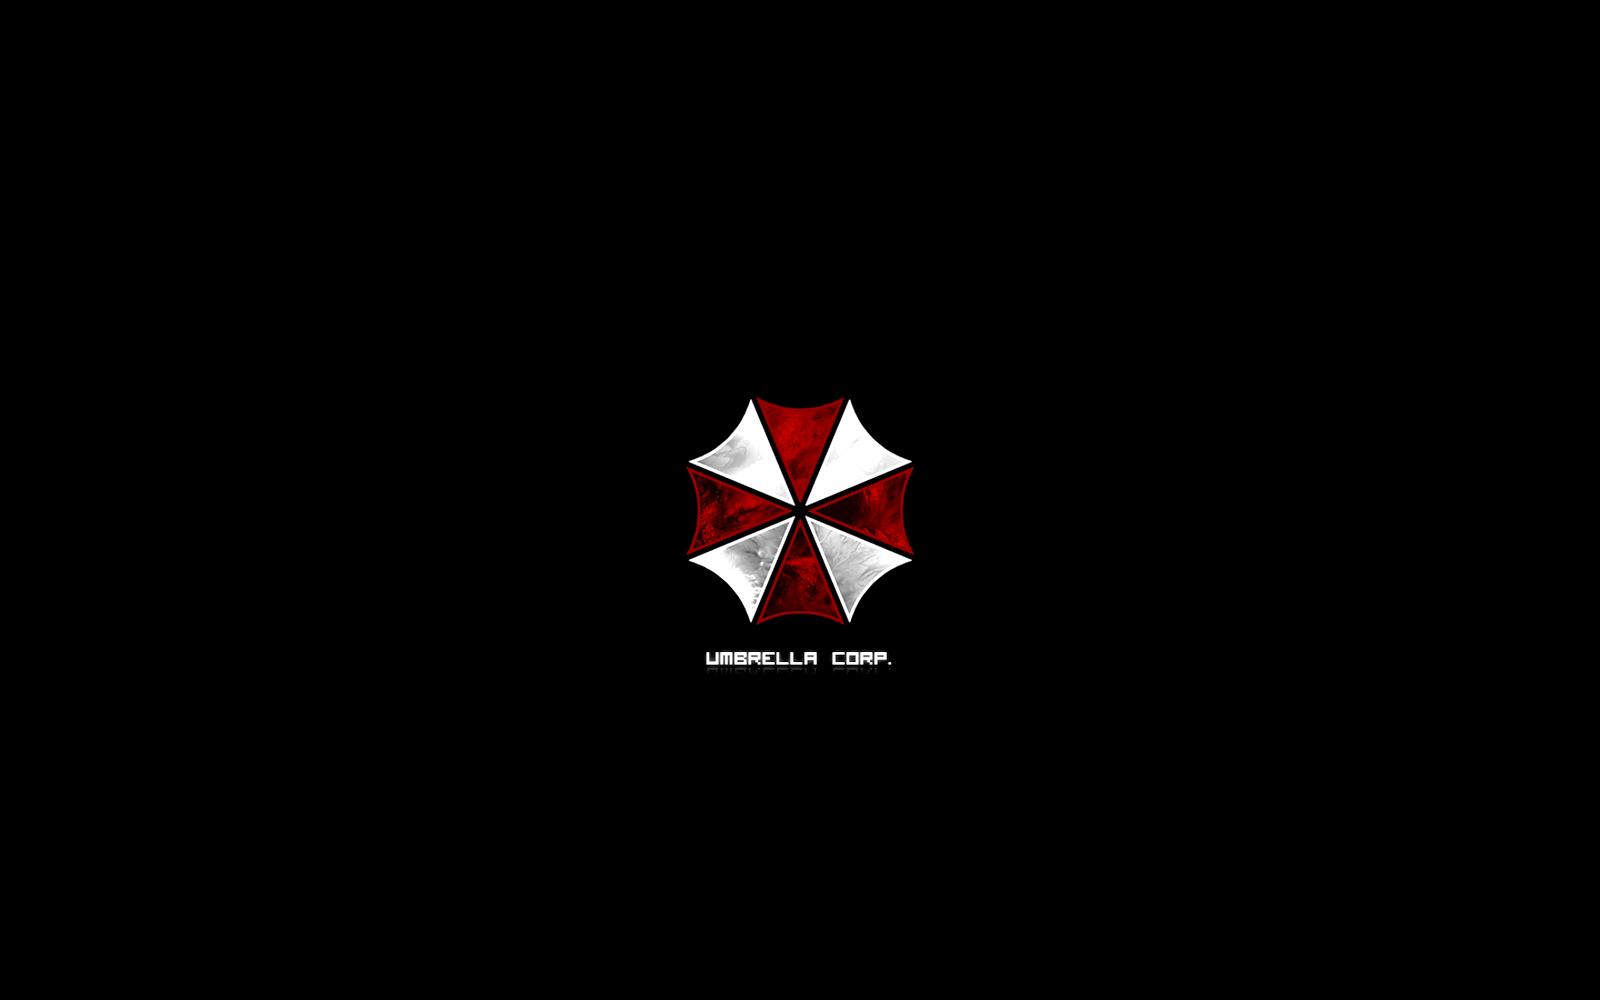 Umbrella Corporation Logo HD Wallpapers Desktop Wallpapers 1600x1000